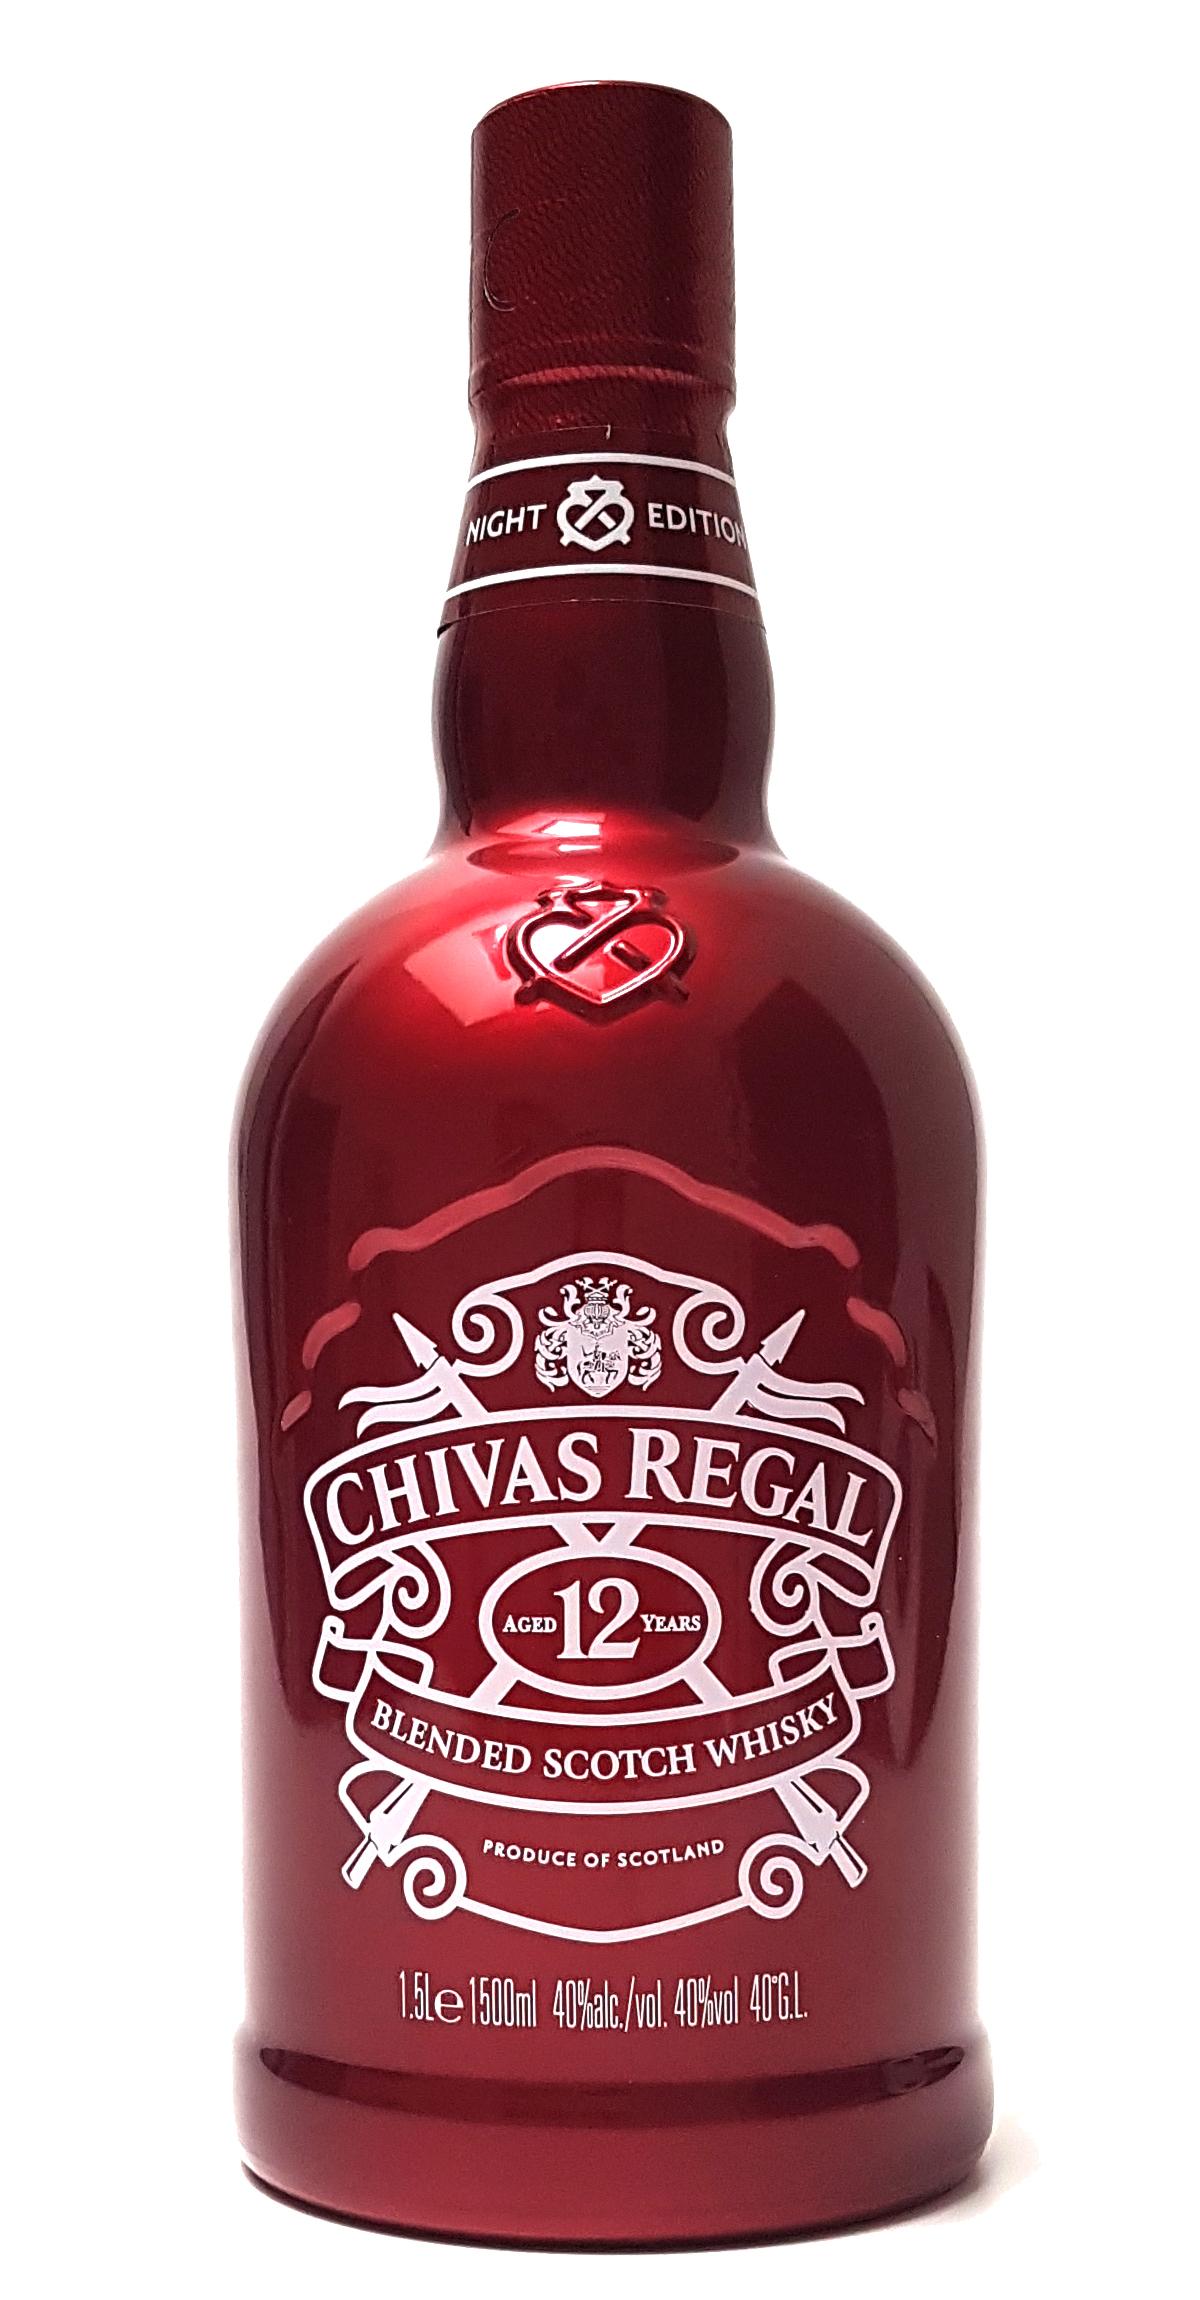 Chivas Regal 12 Jahre Blended Scotch Whisky - Night Edition 1,5L (40% Vol)